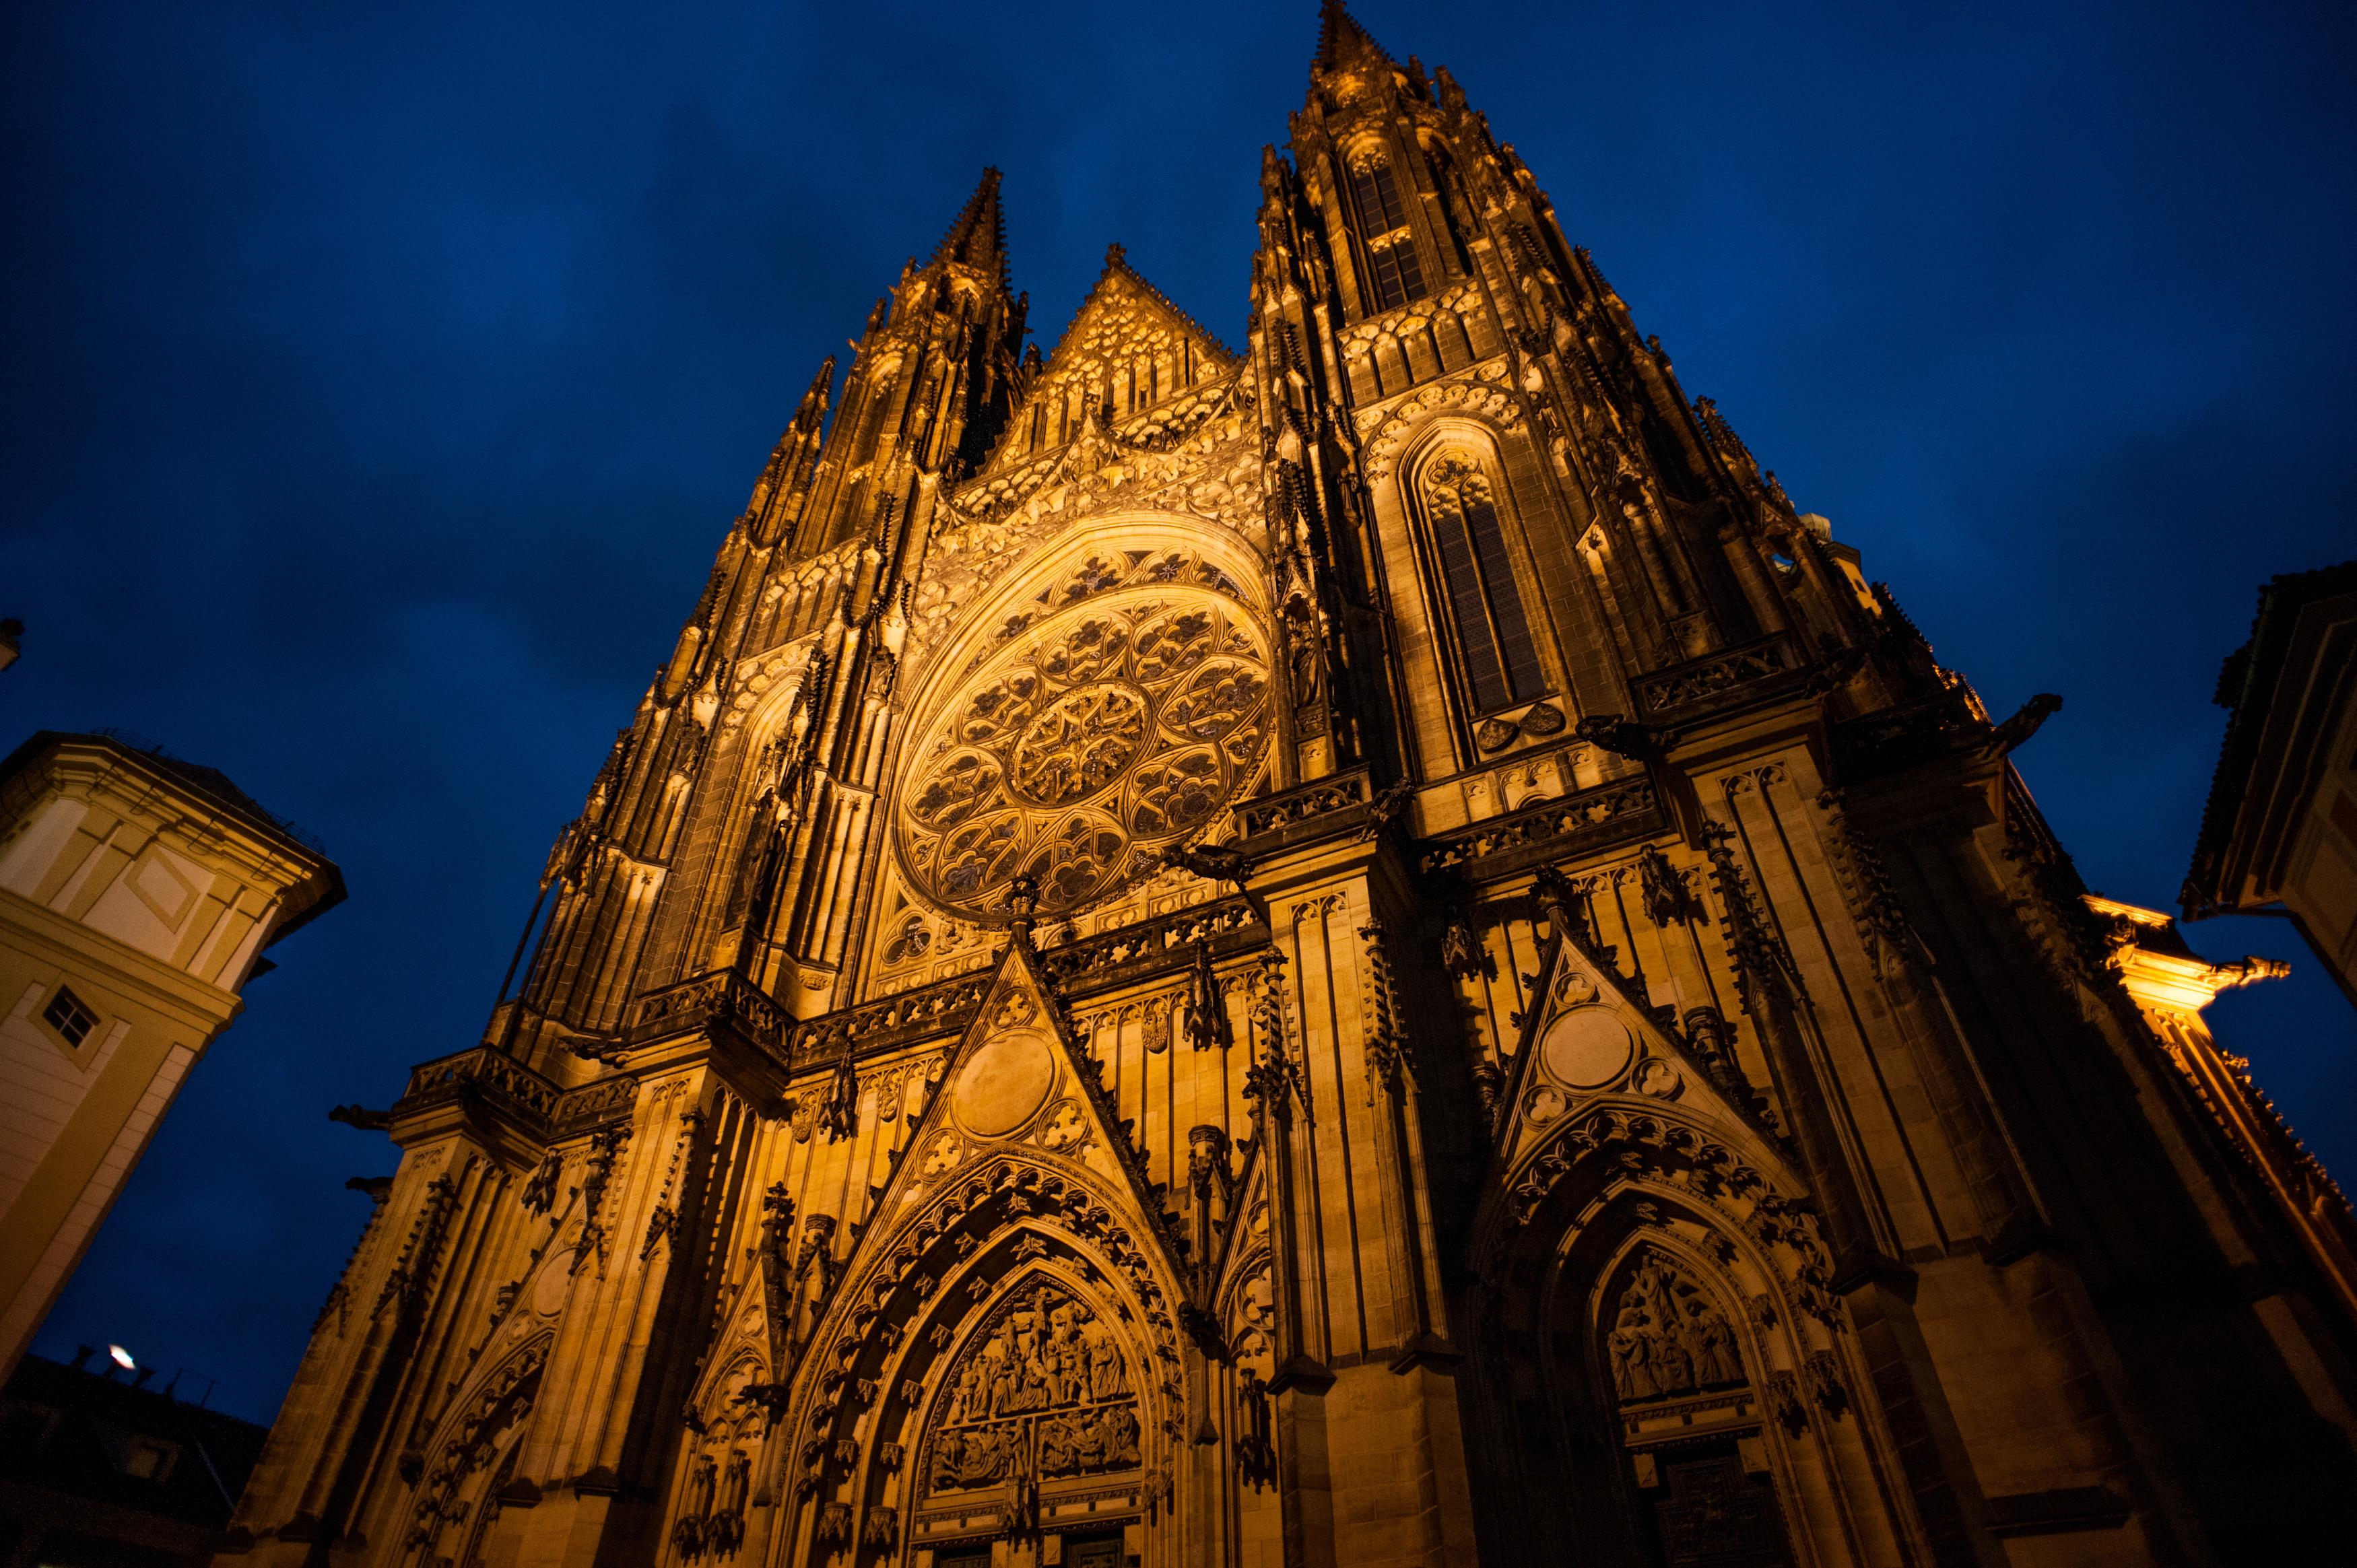 6ef023b46 File:Saint Vitus Cathedral exterior at night. Prague, Czech Republic, Western  Europe. October 24, 2012.jpg